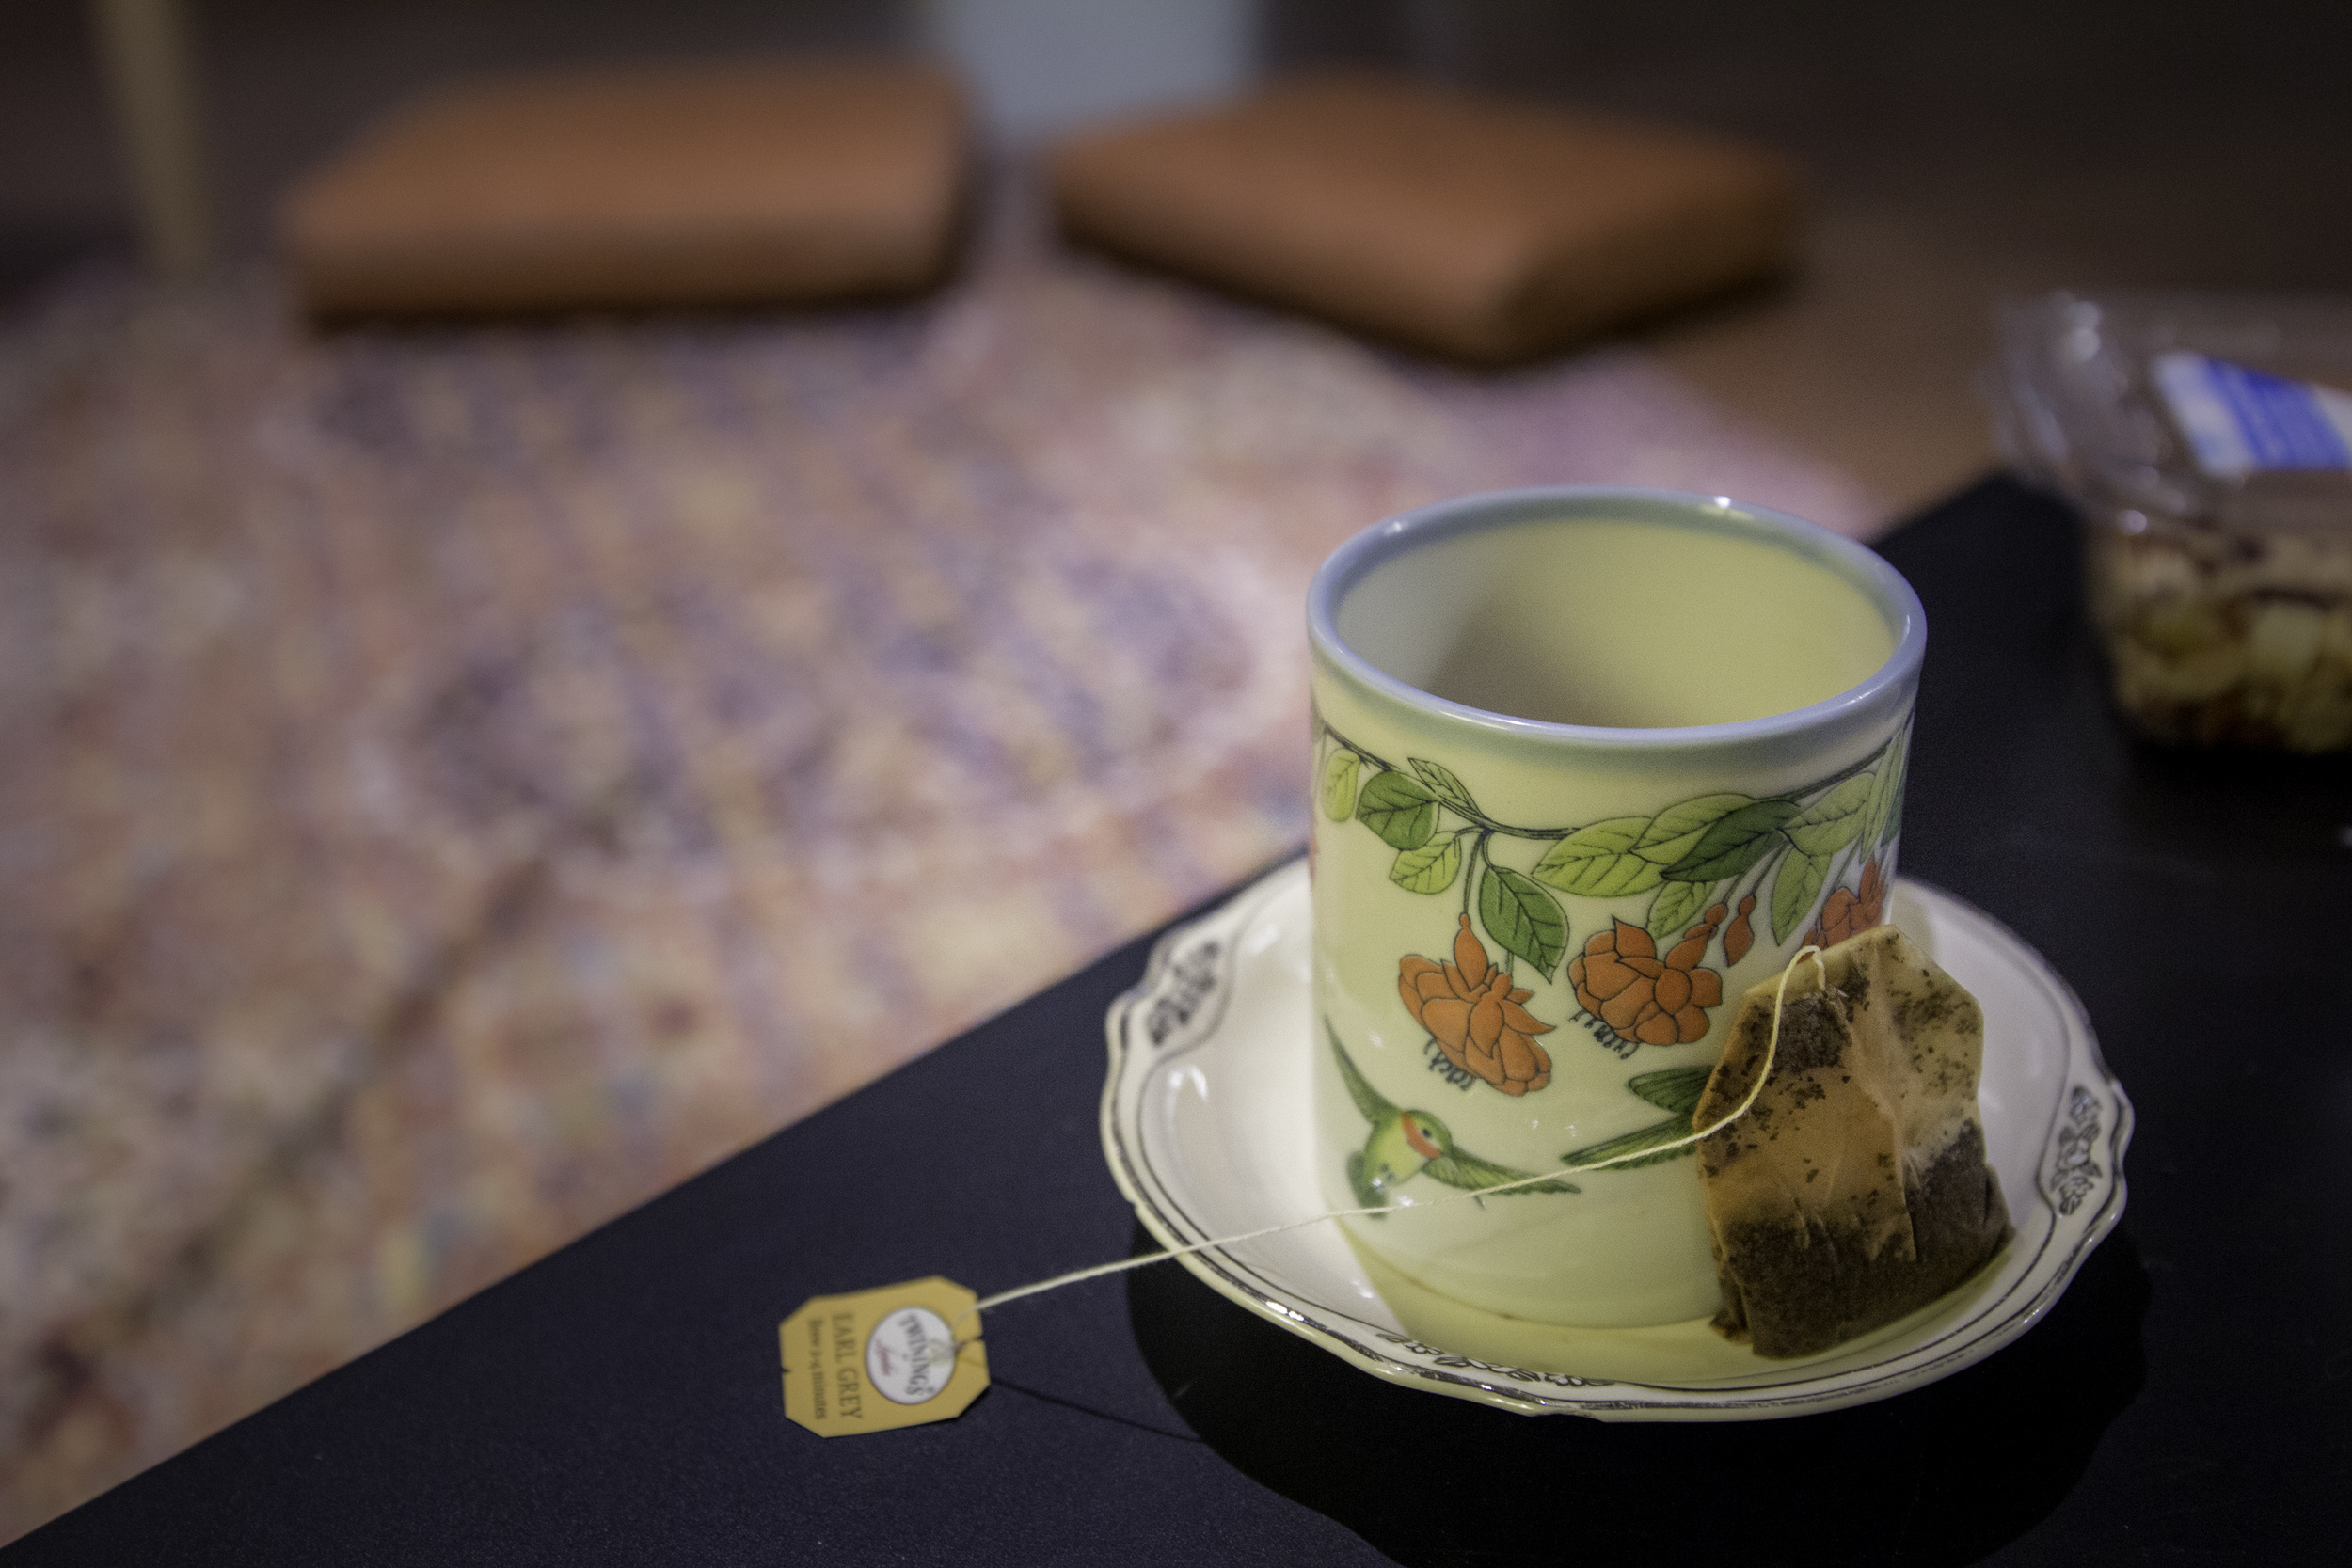 Cup_Of_Tea_Presentatioin-1.jpg